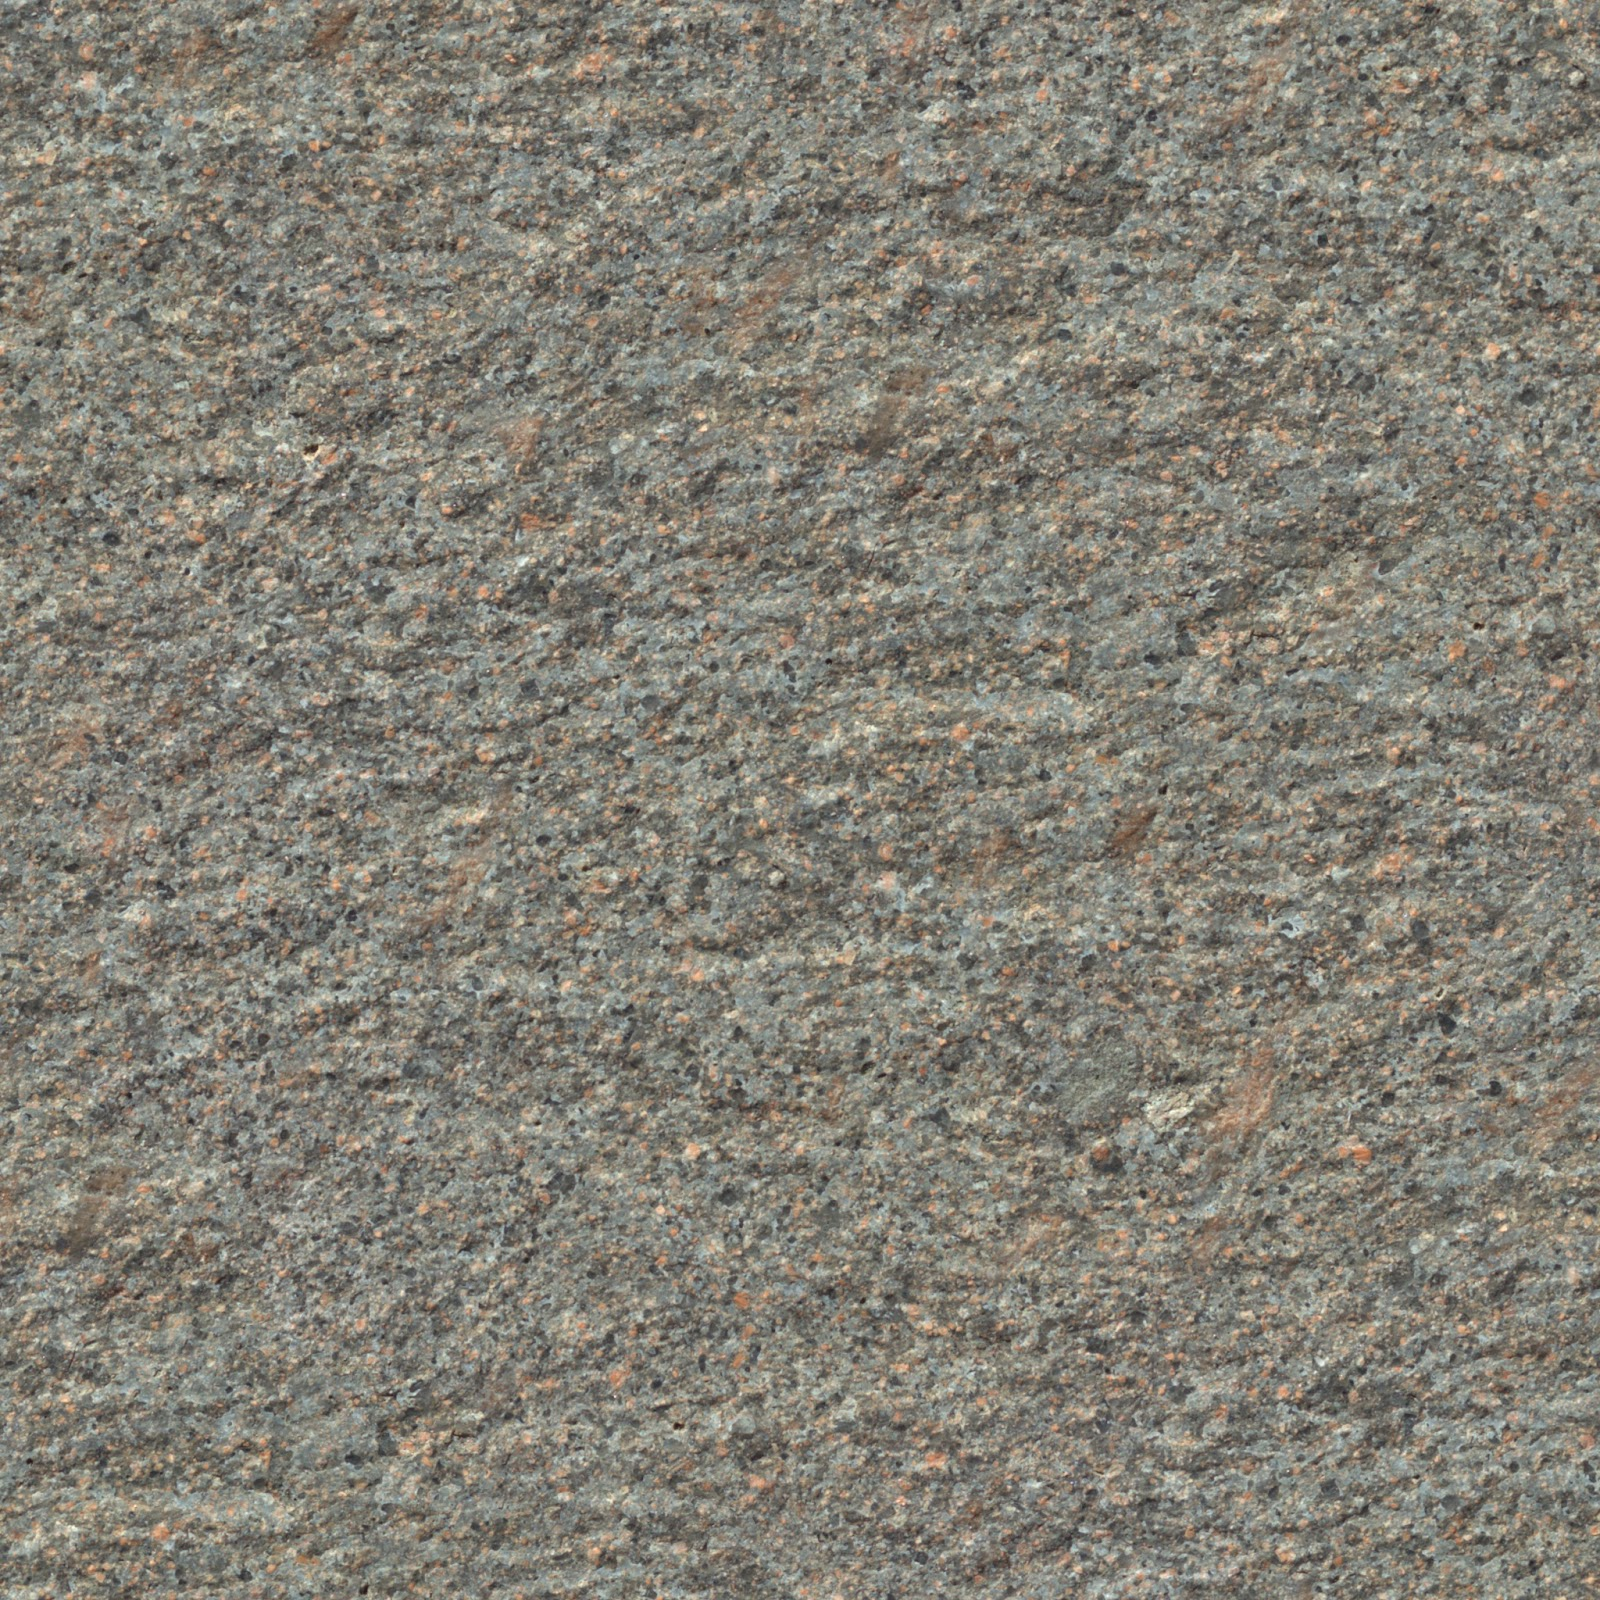 High Resolution Seamless Textures: Rock surface detail ...